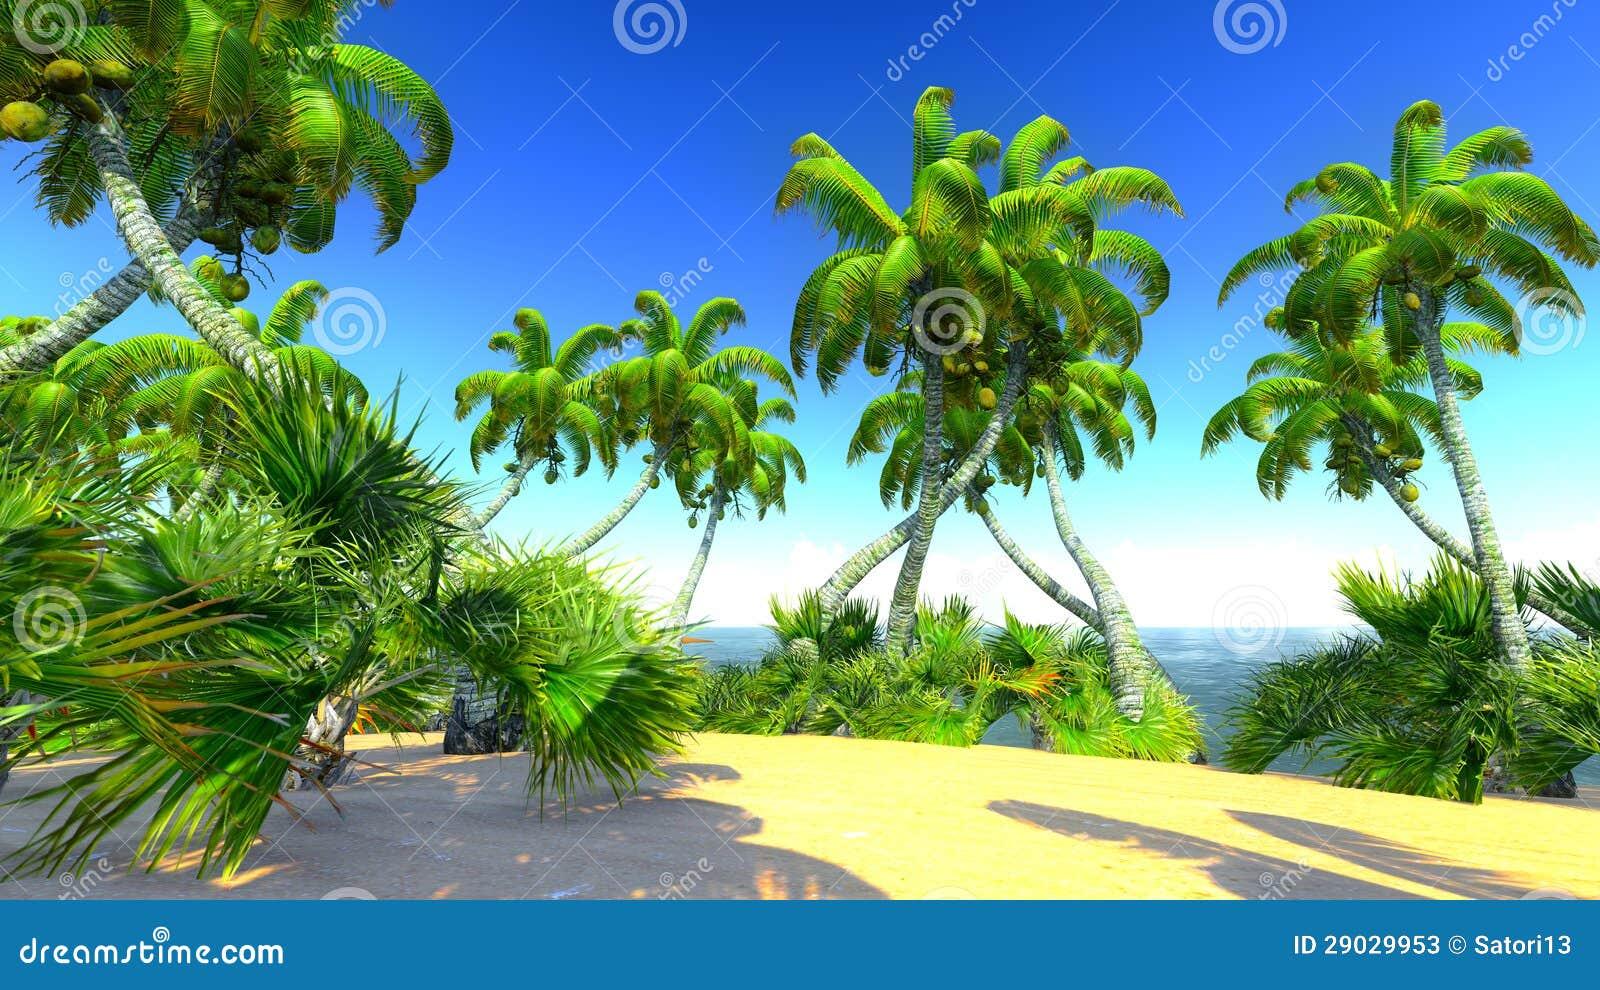 stock image of hawaiian - photo #20